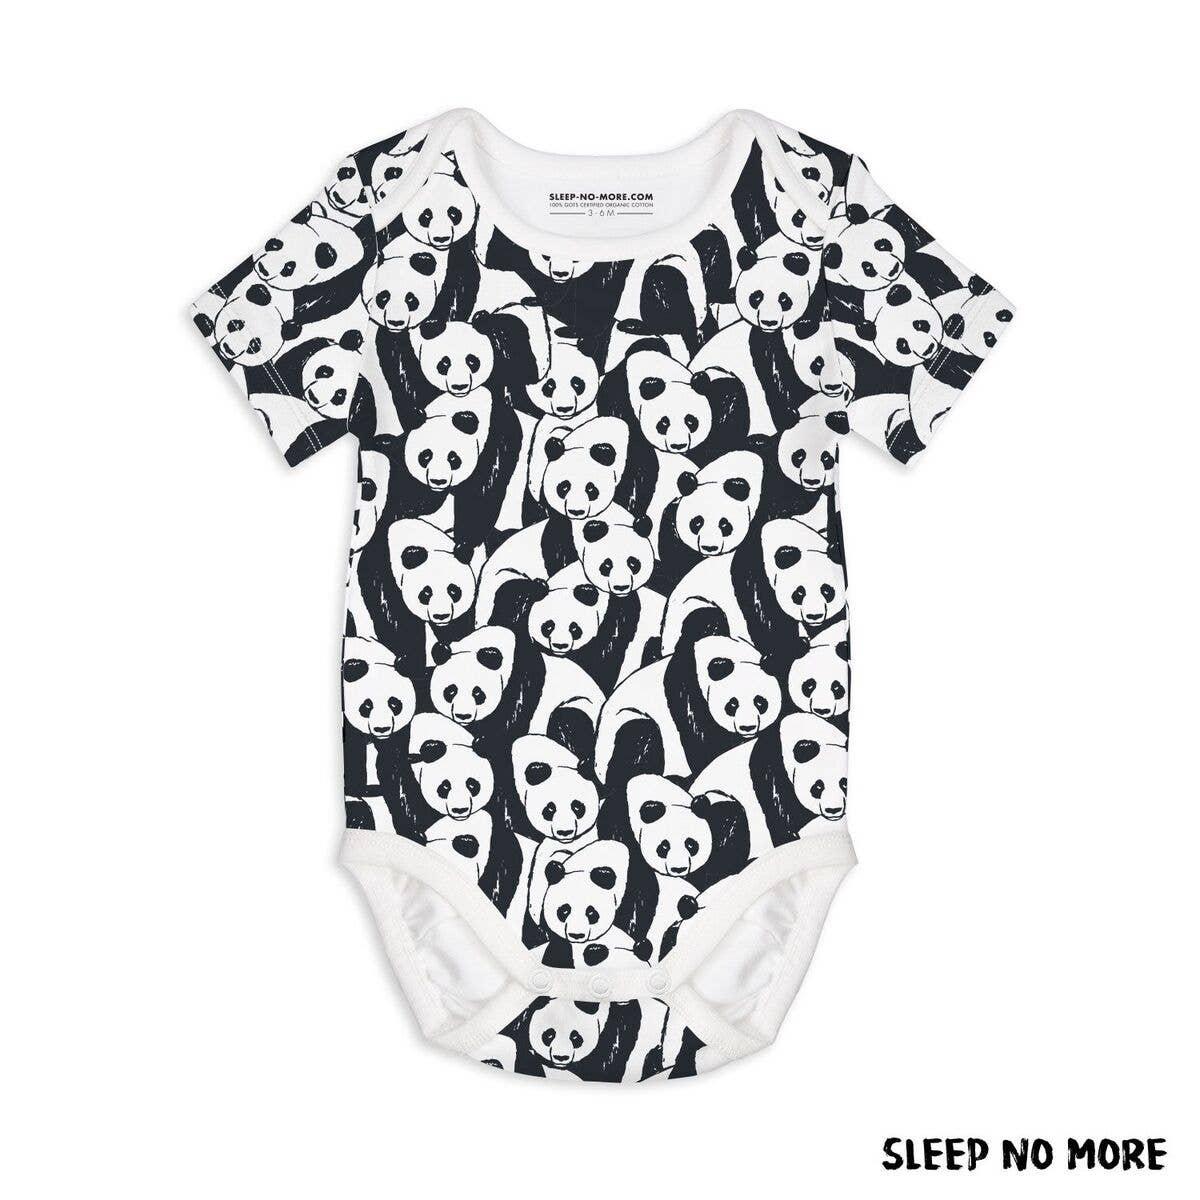 Cheng Jian Bo Vegan Dinosaur Vegan Toddler Girls T Shirt Kids Cotton Short Sleeve Ruffle Tee